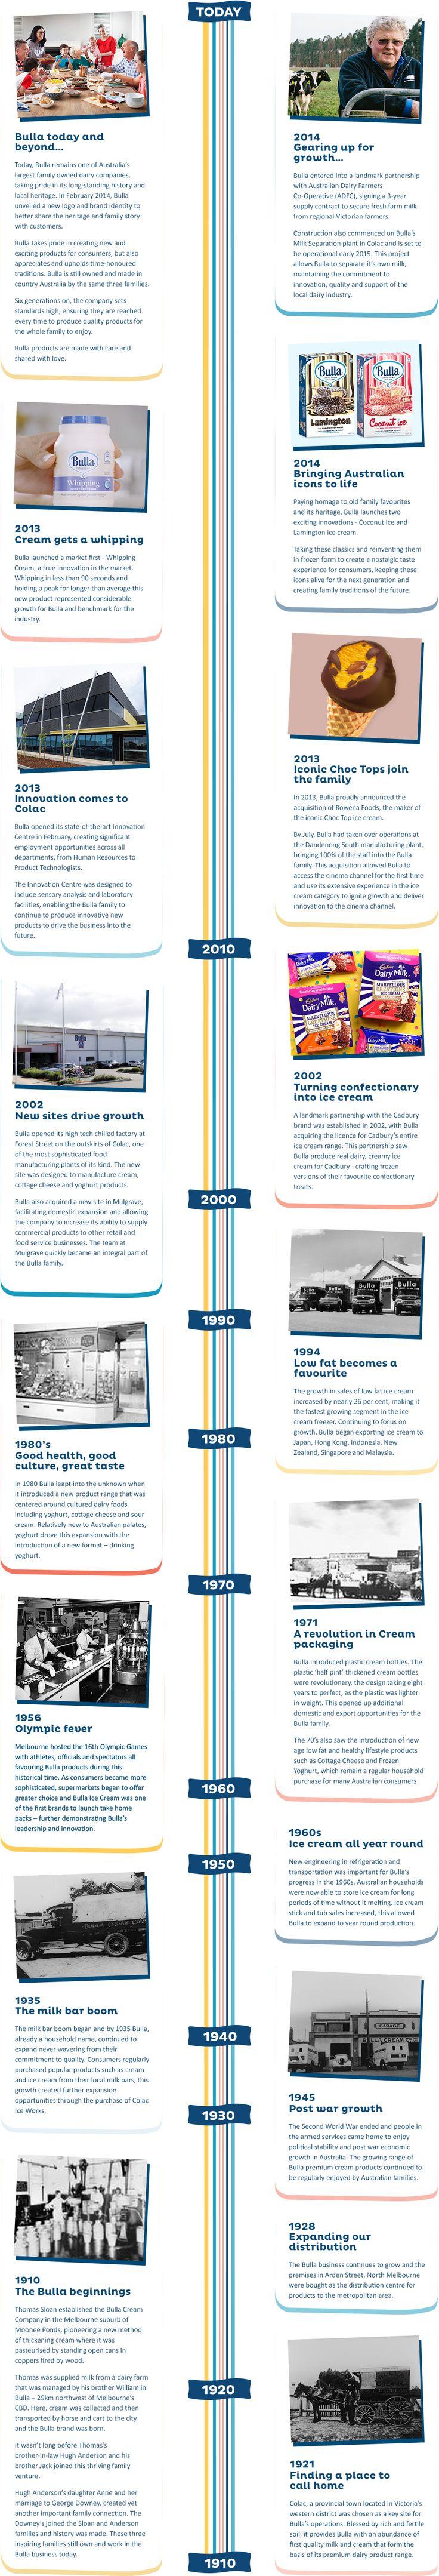 Bulla History